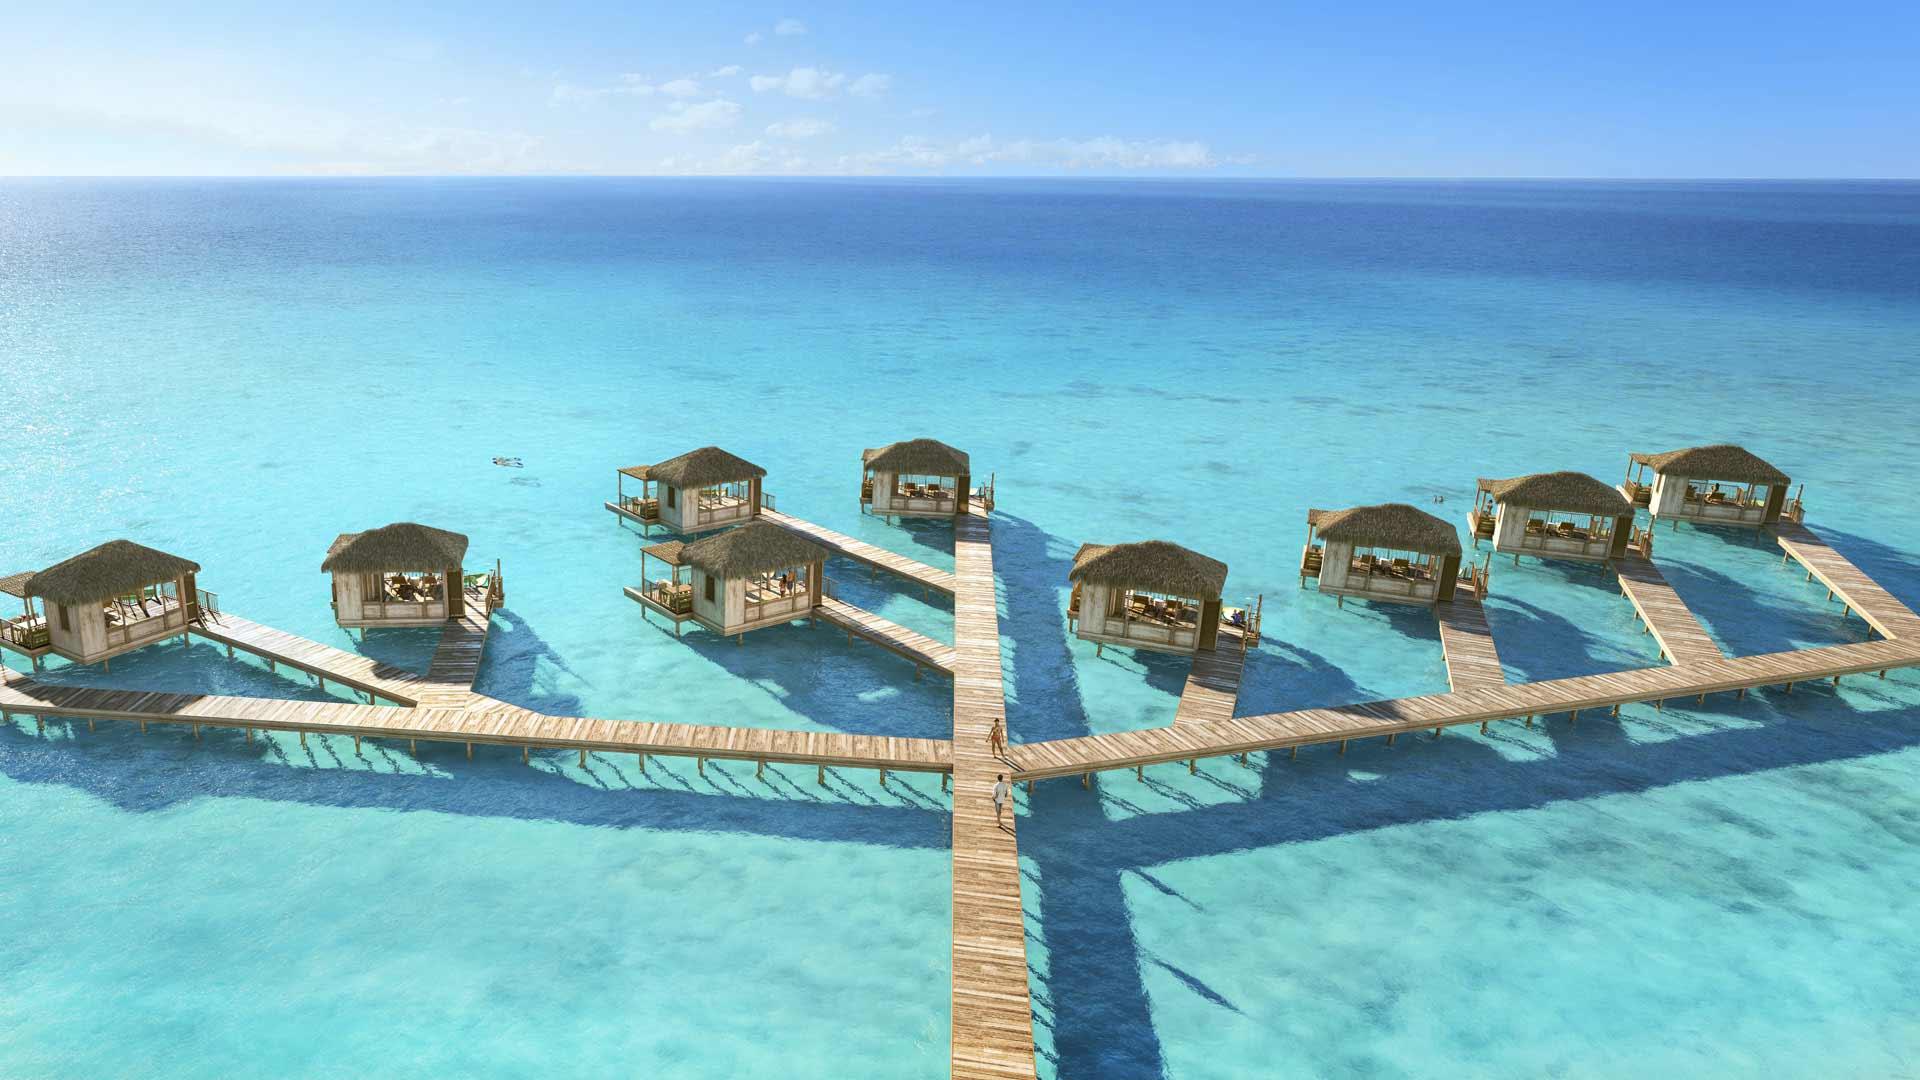 Royal Caribbean a CocoCay